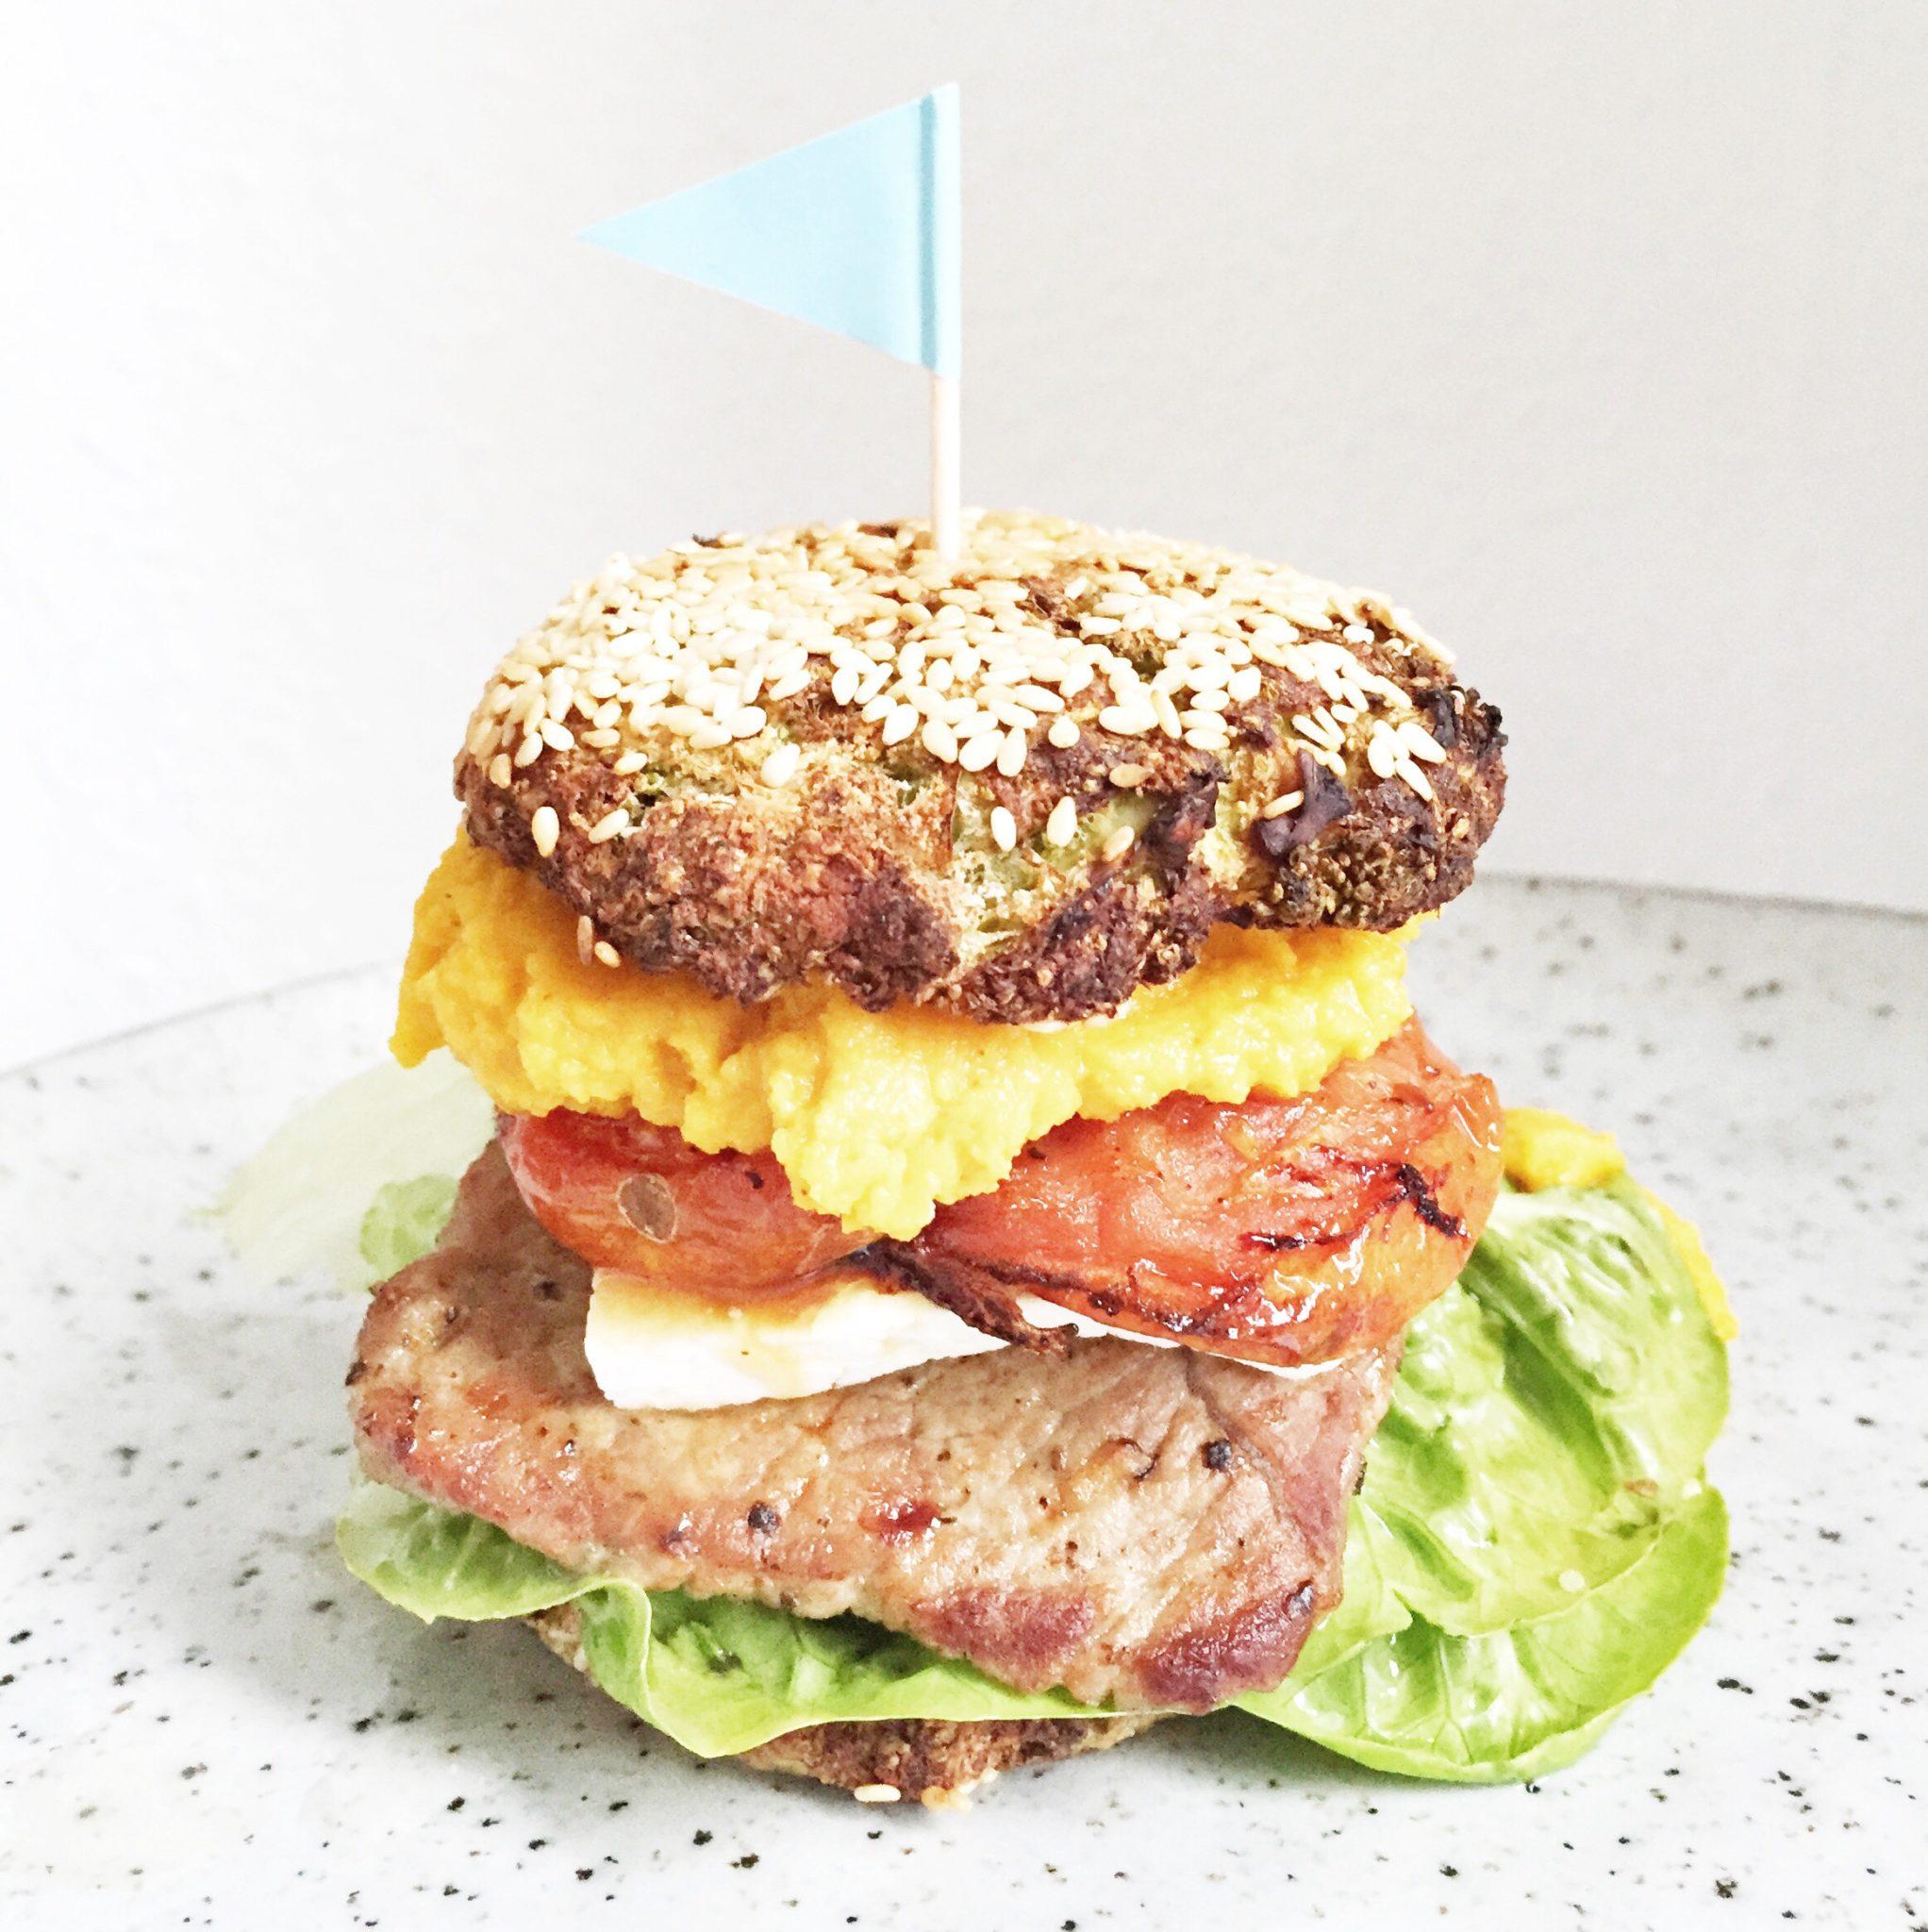 sund burger med broccoliboller og gulerodshummus